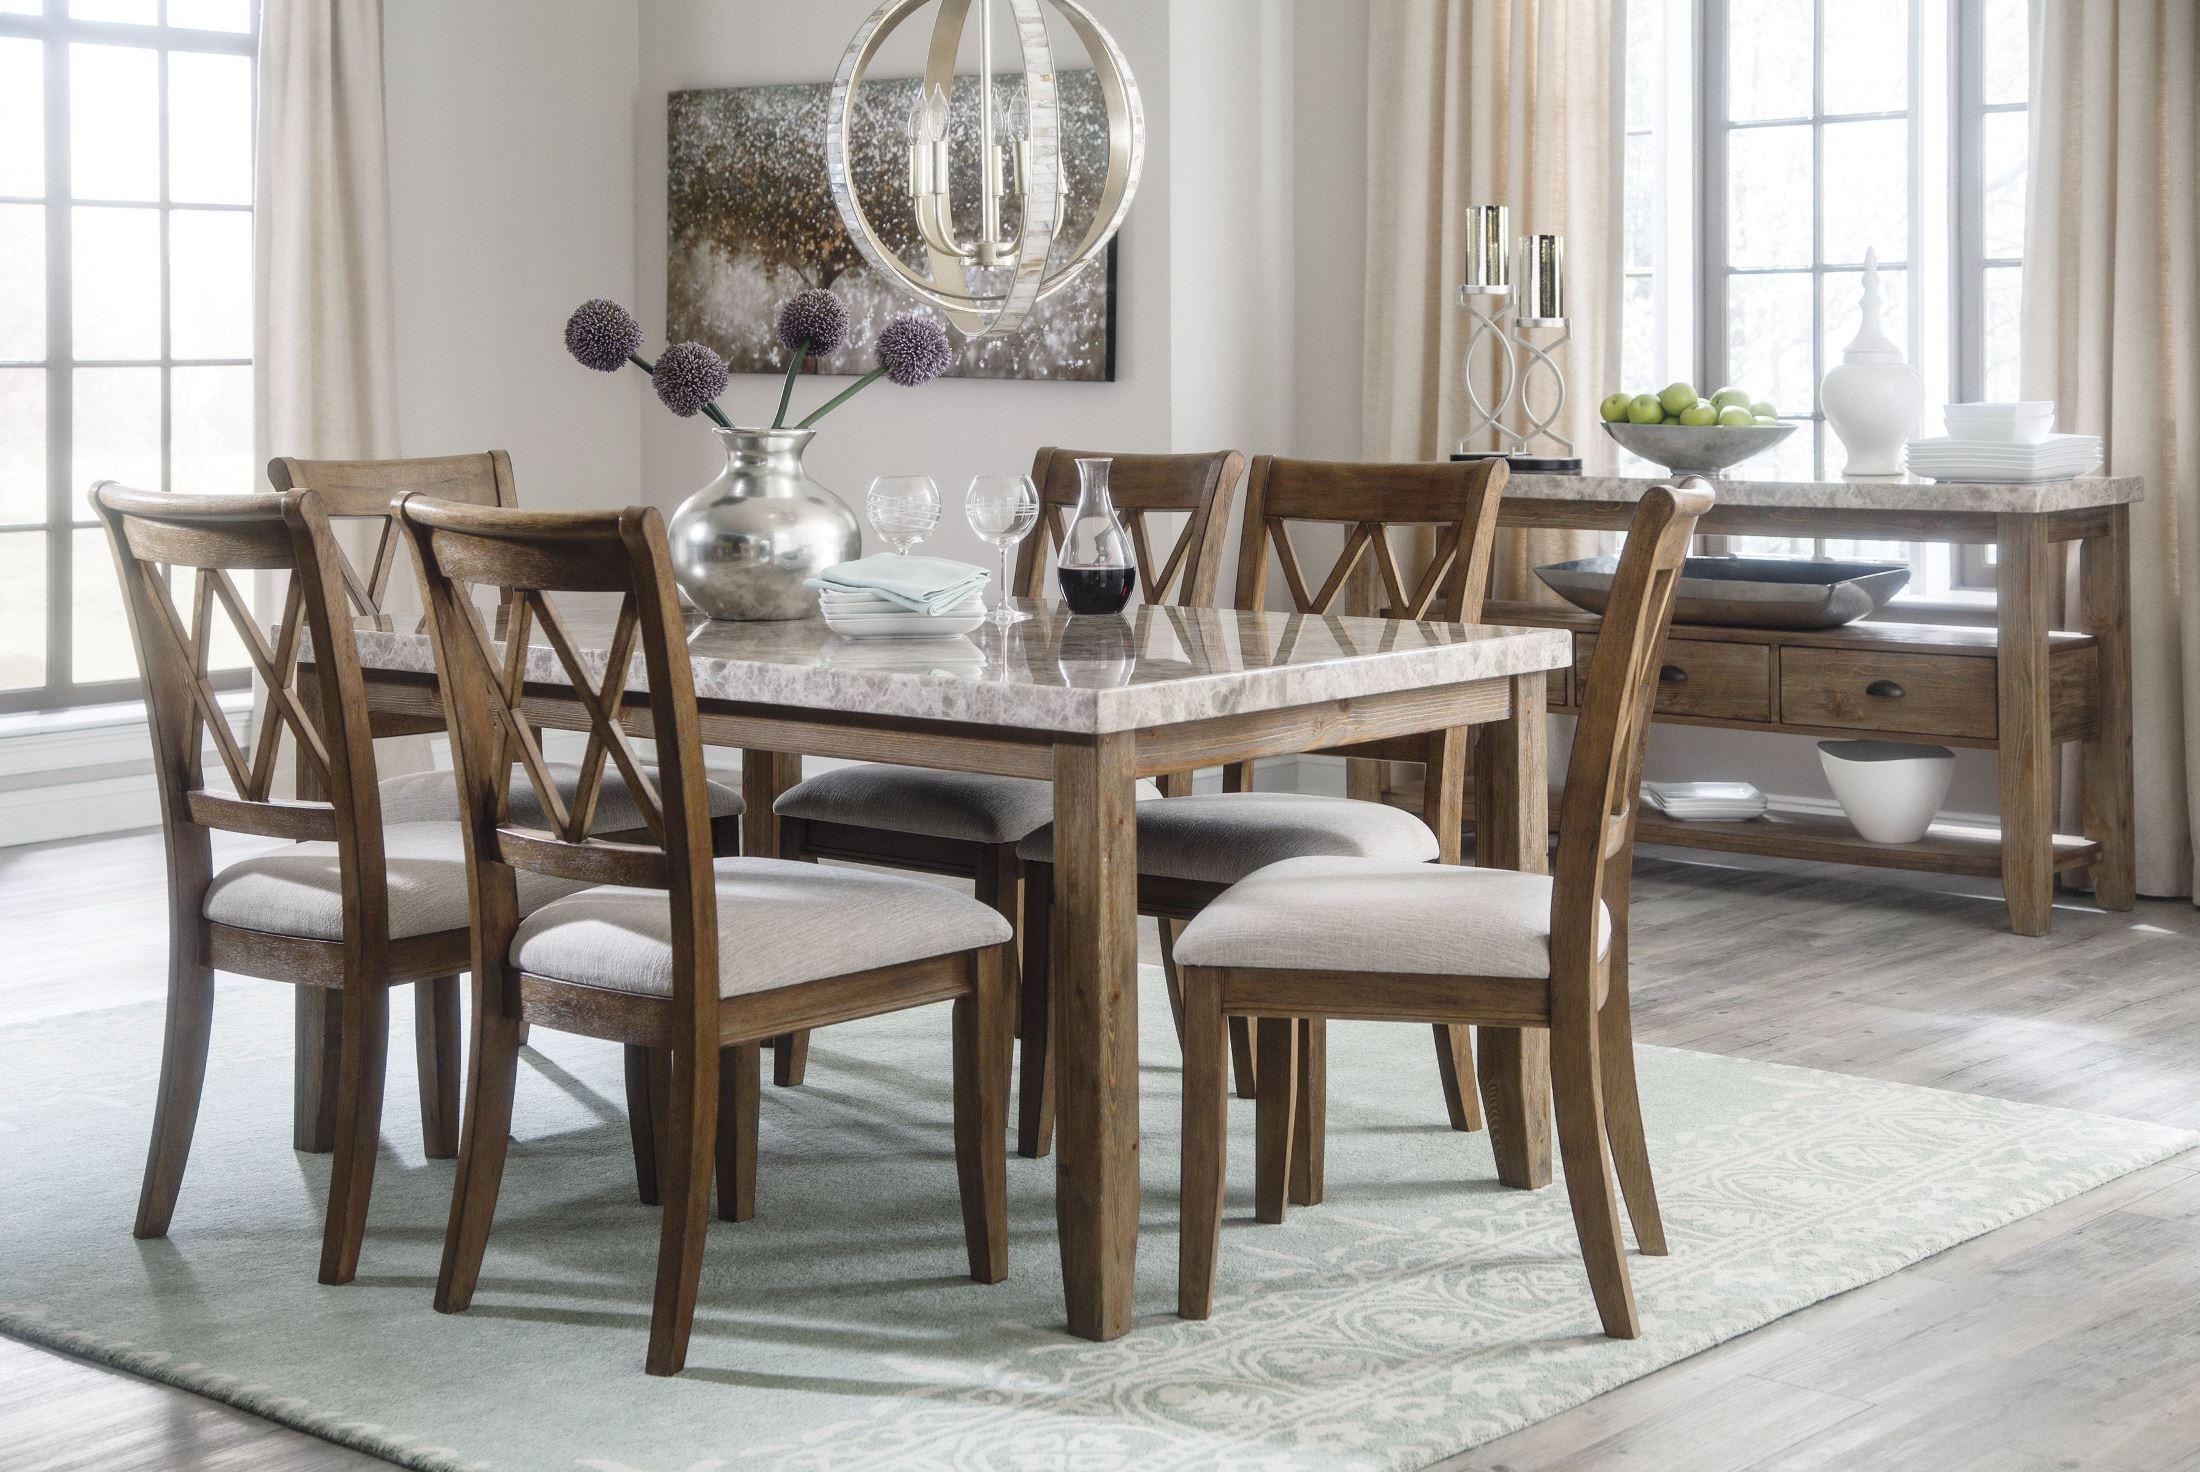 narvilla two tone rectangular dining room set d559 25 ashley. Black Bedroom Furniture Sets. Home Design Ideas